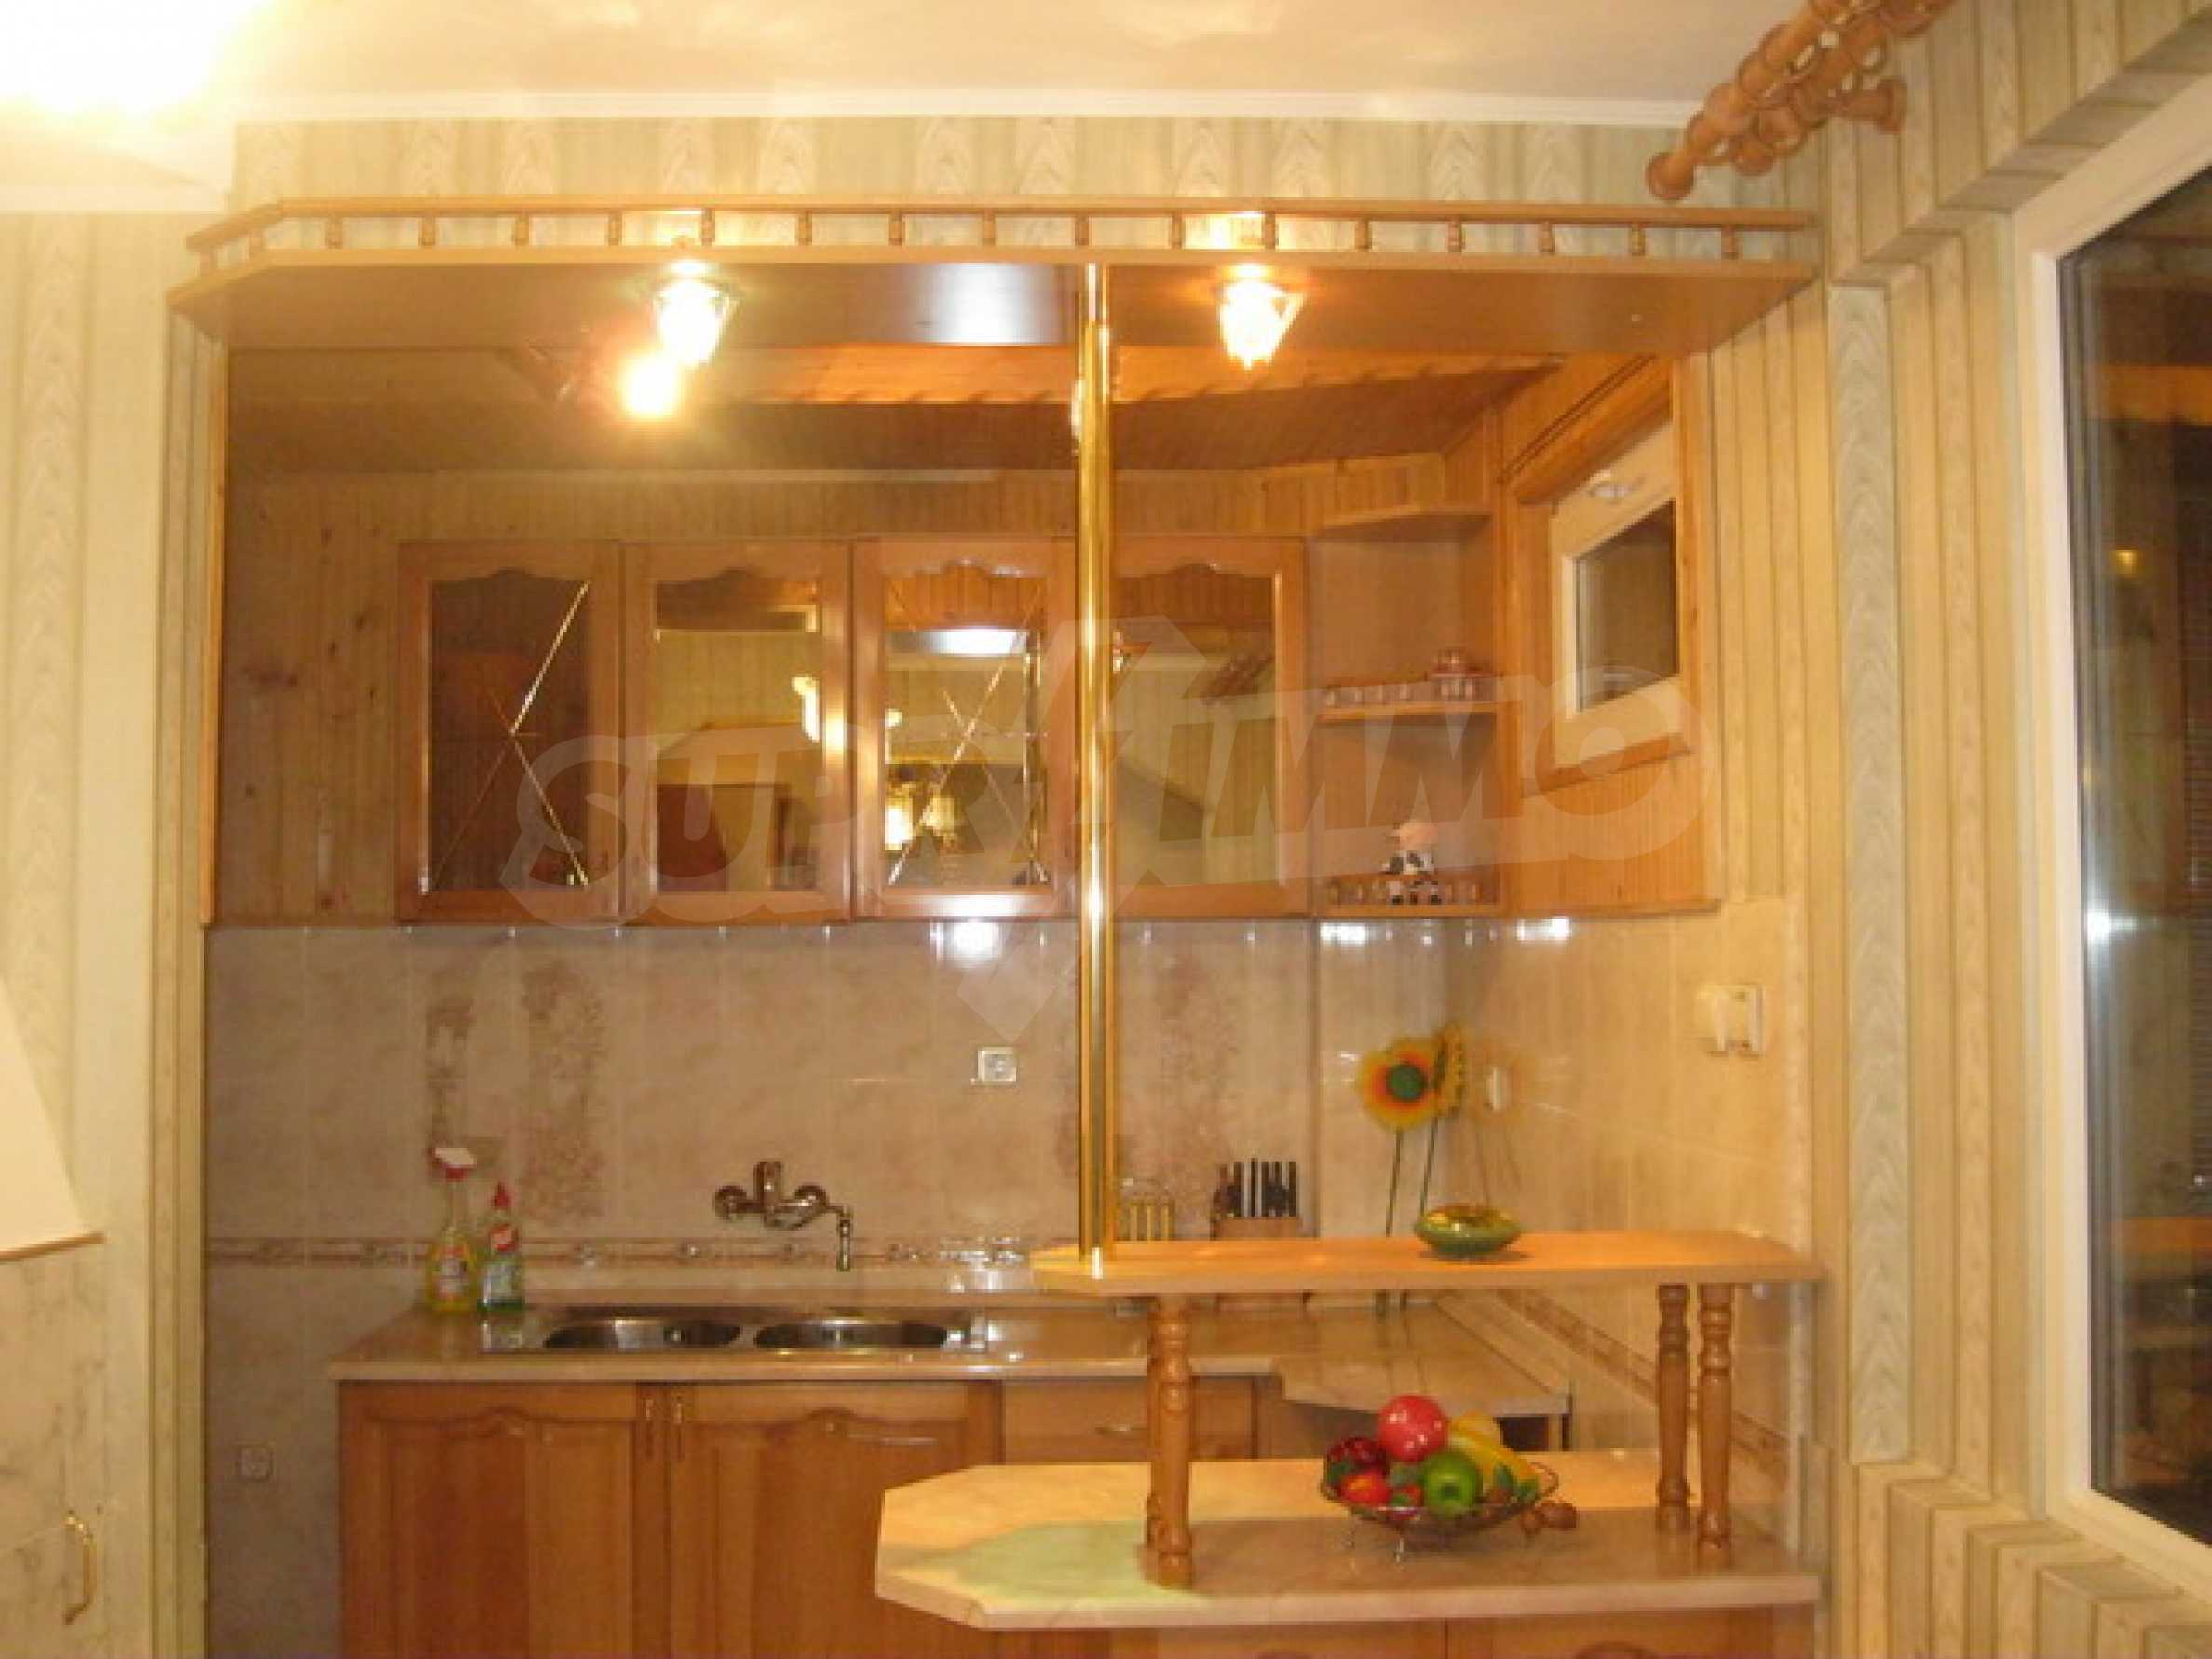 Wonderful apartment in Gabrovo 3